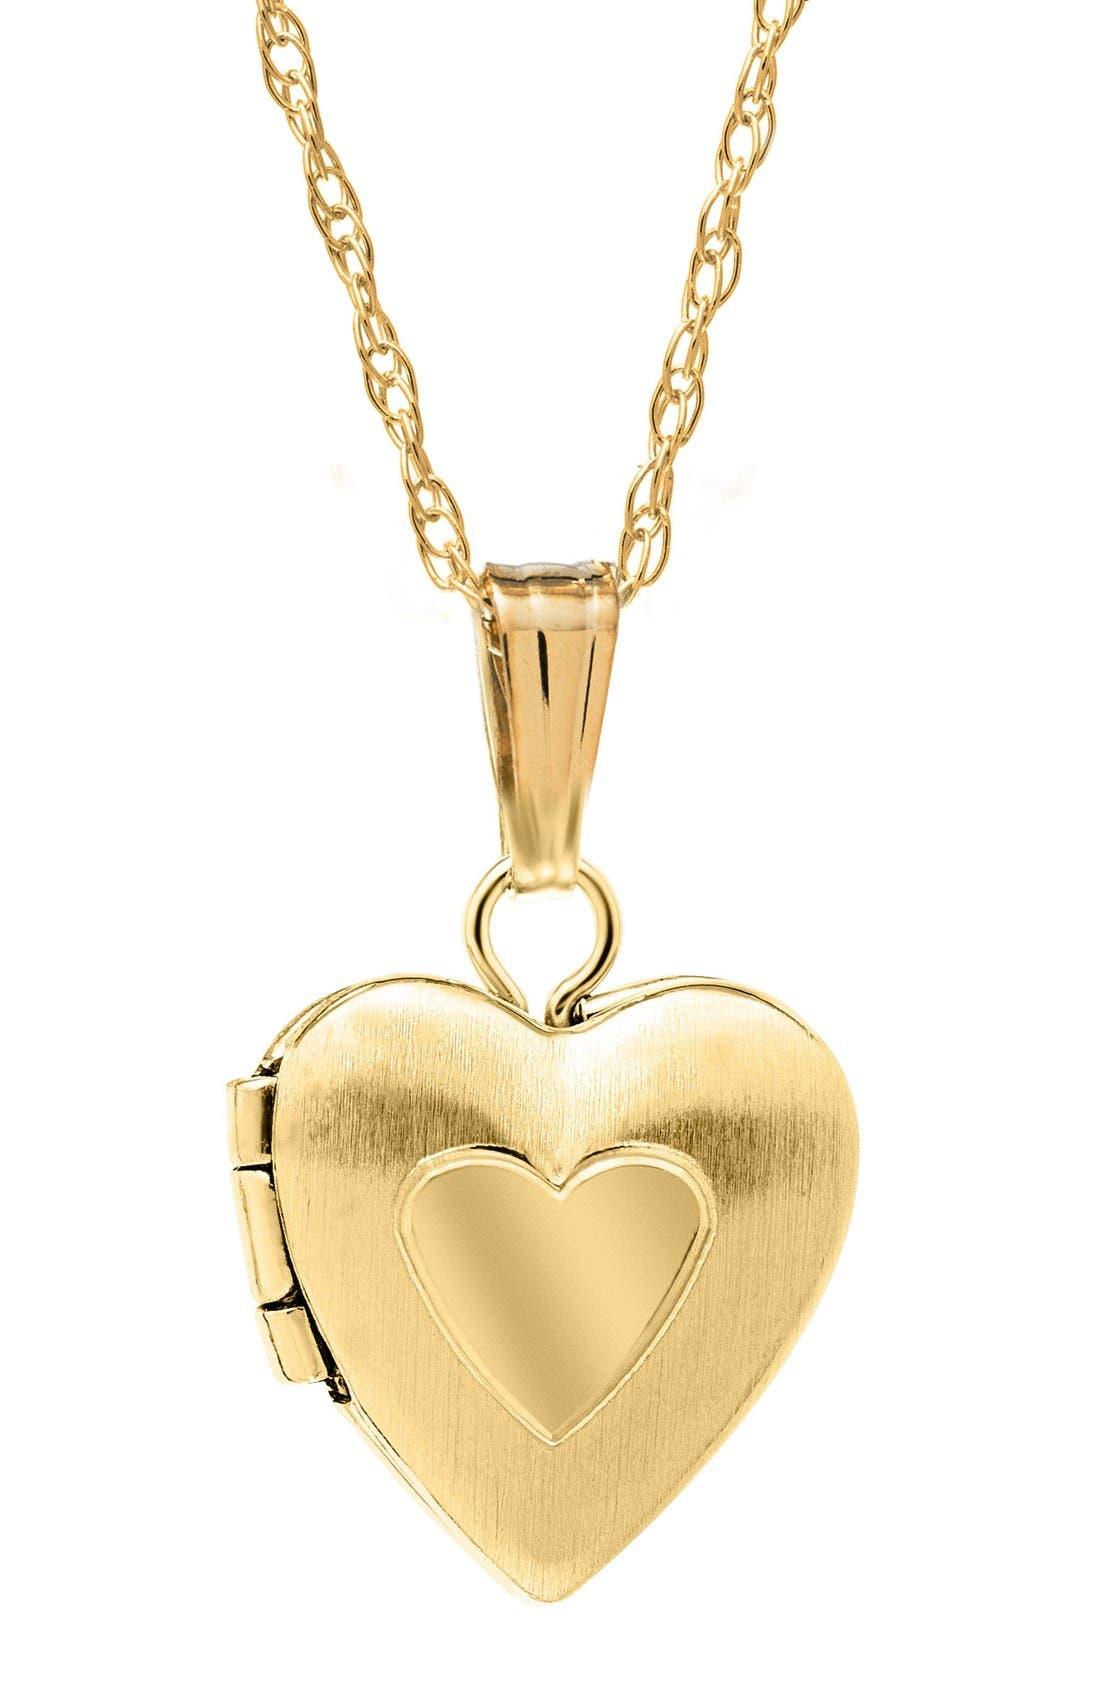 MIGNONETTE 14k Gold Heart Locket Necklace